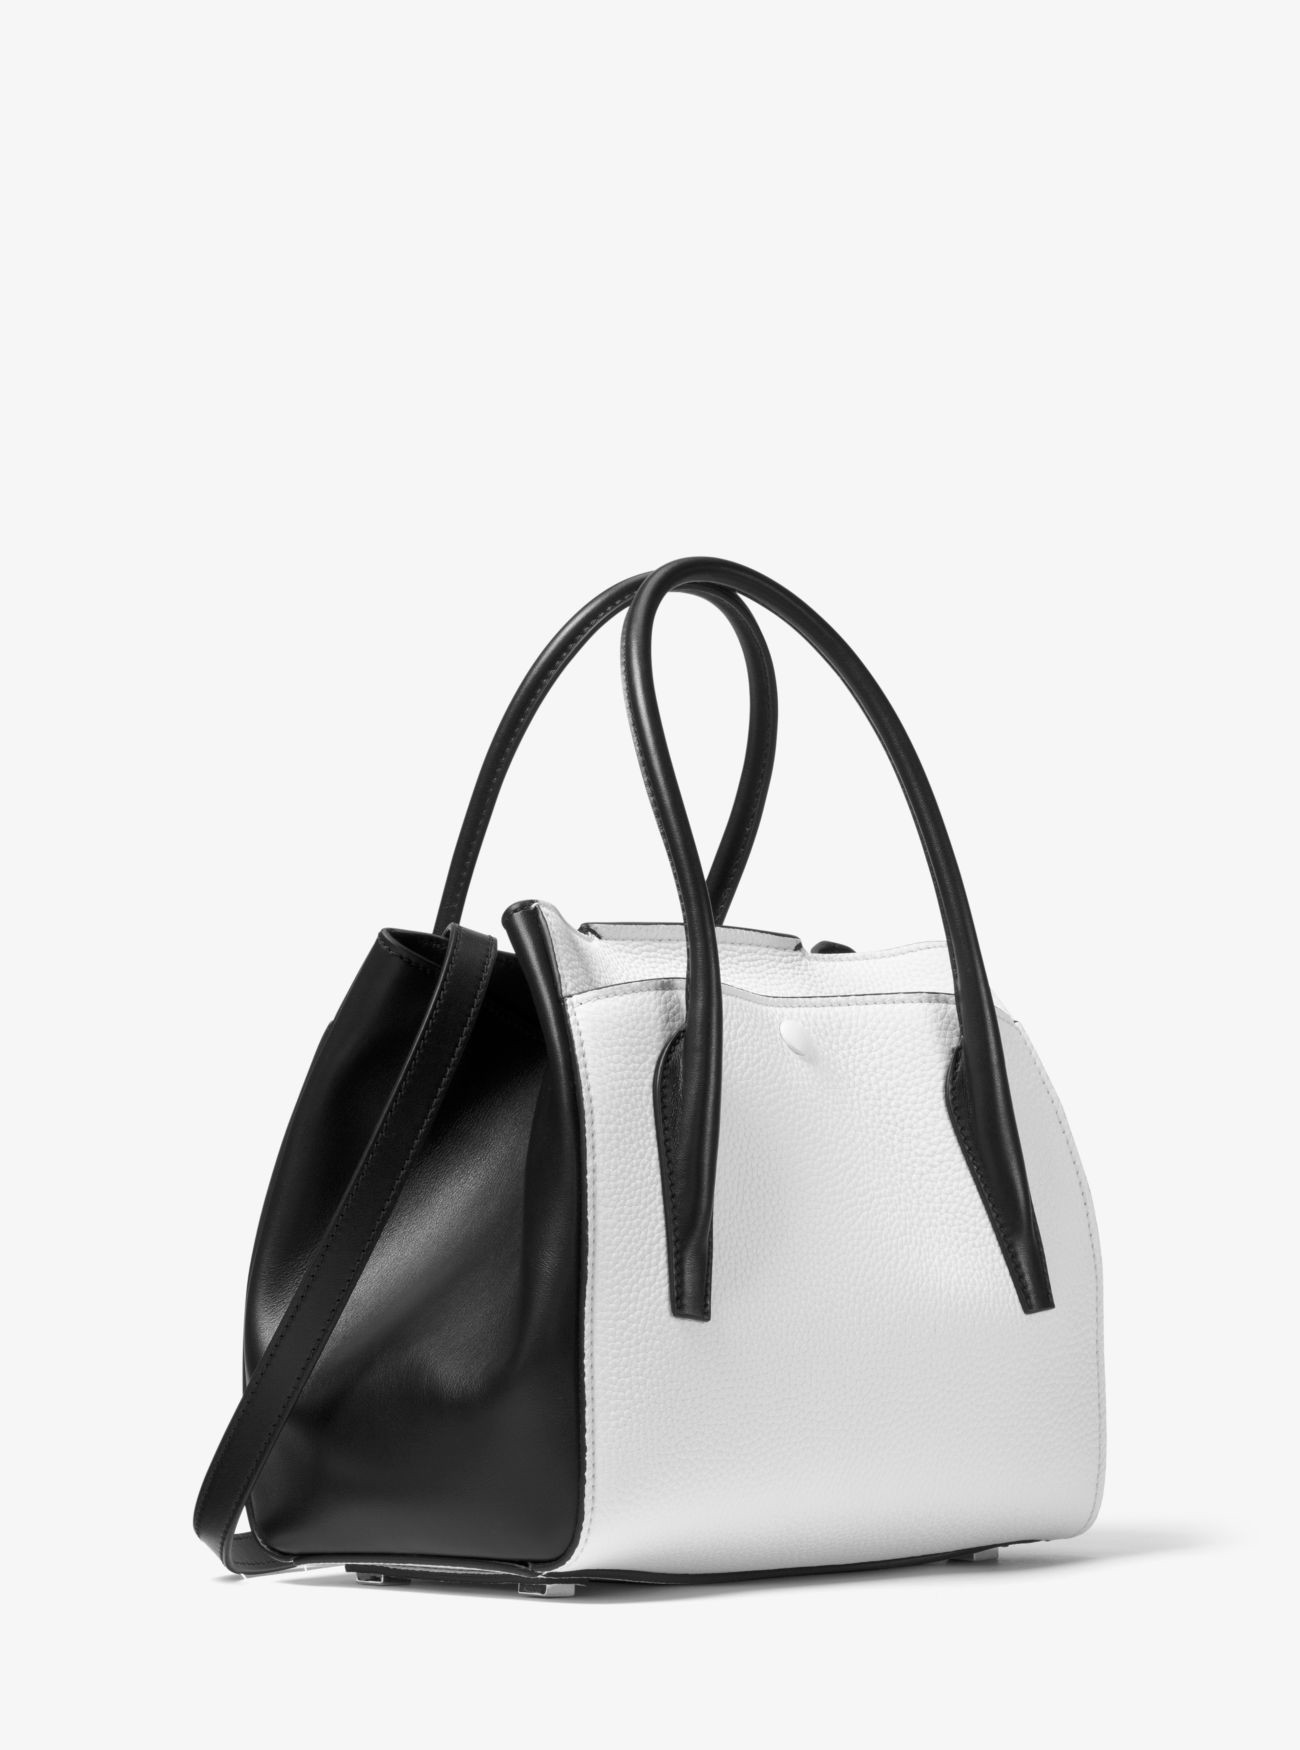 ec49d9506379 Michael Kors Bancroft Medium Calf Leather Satchel - Optic White ...